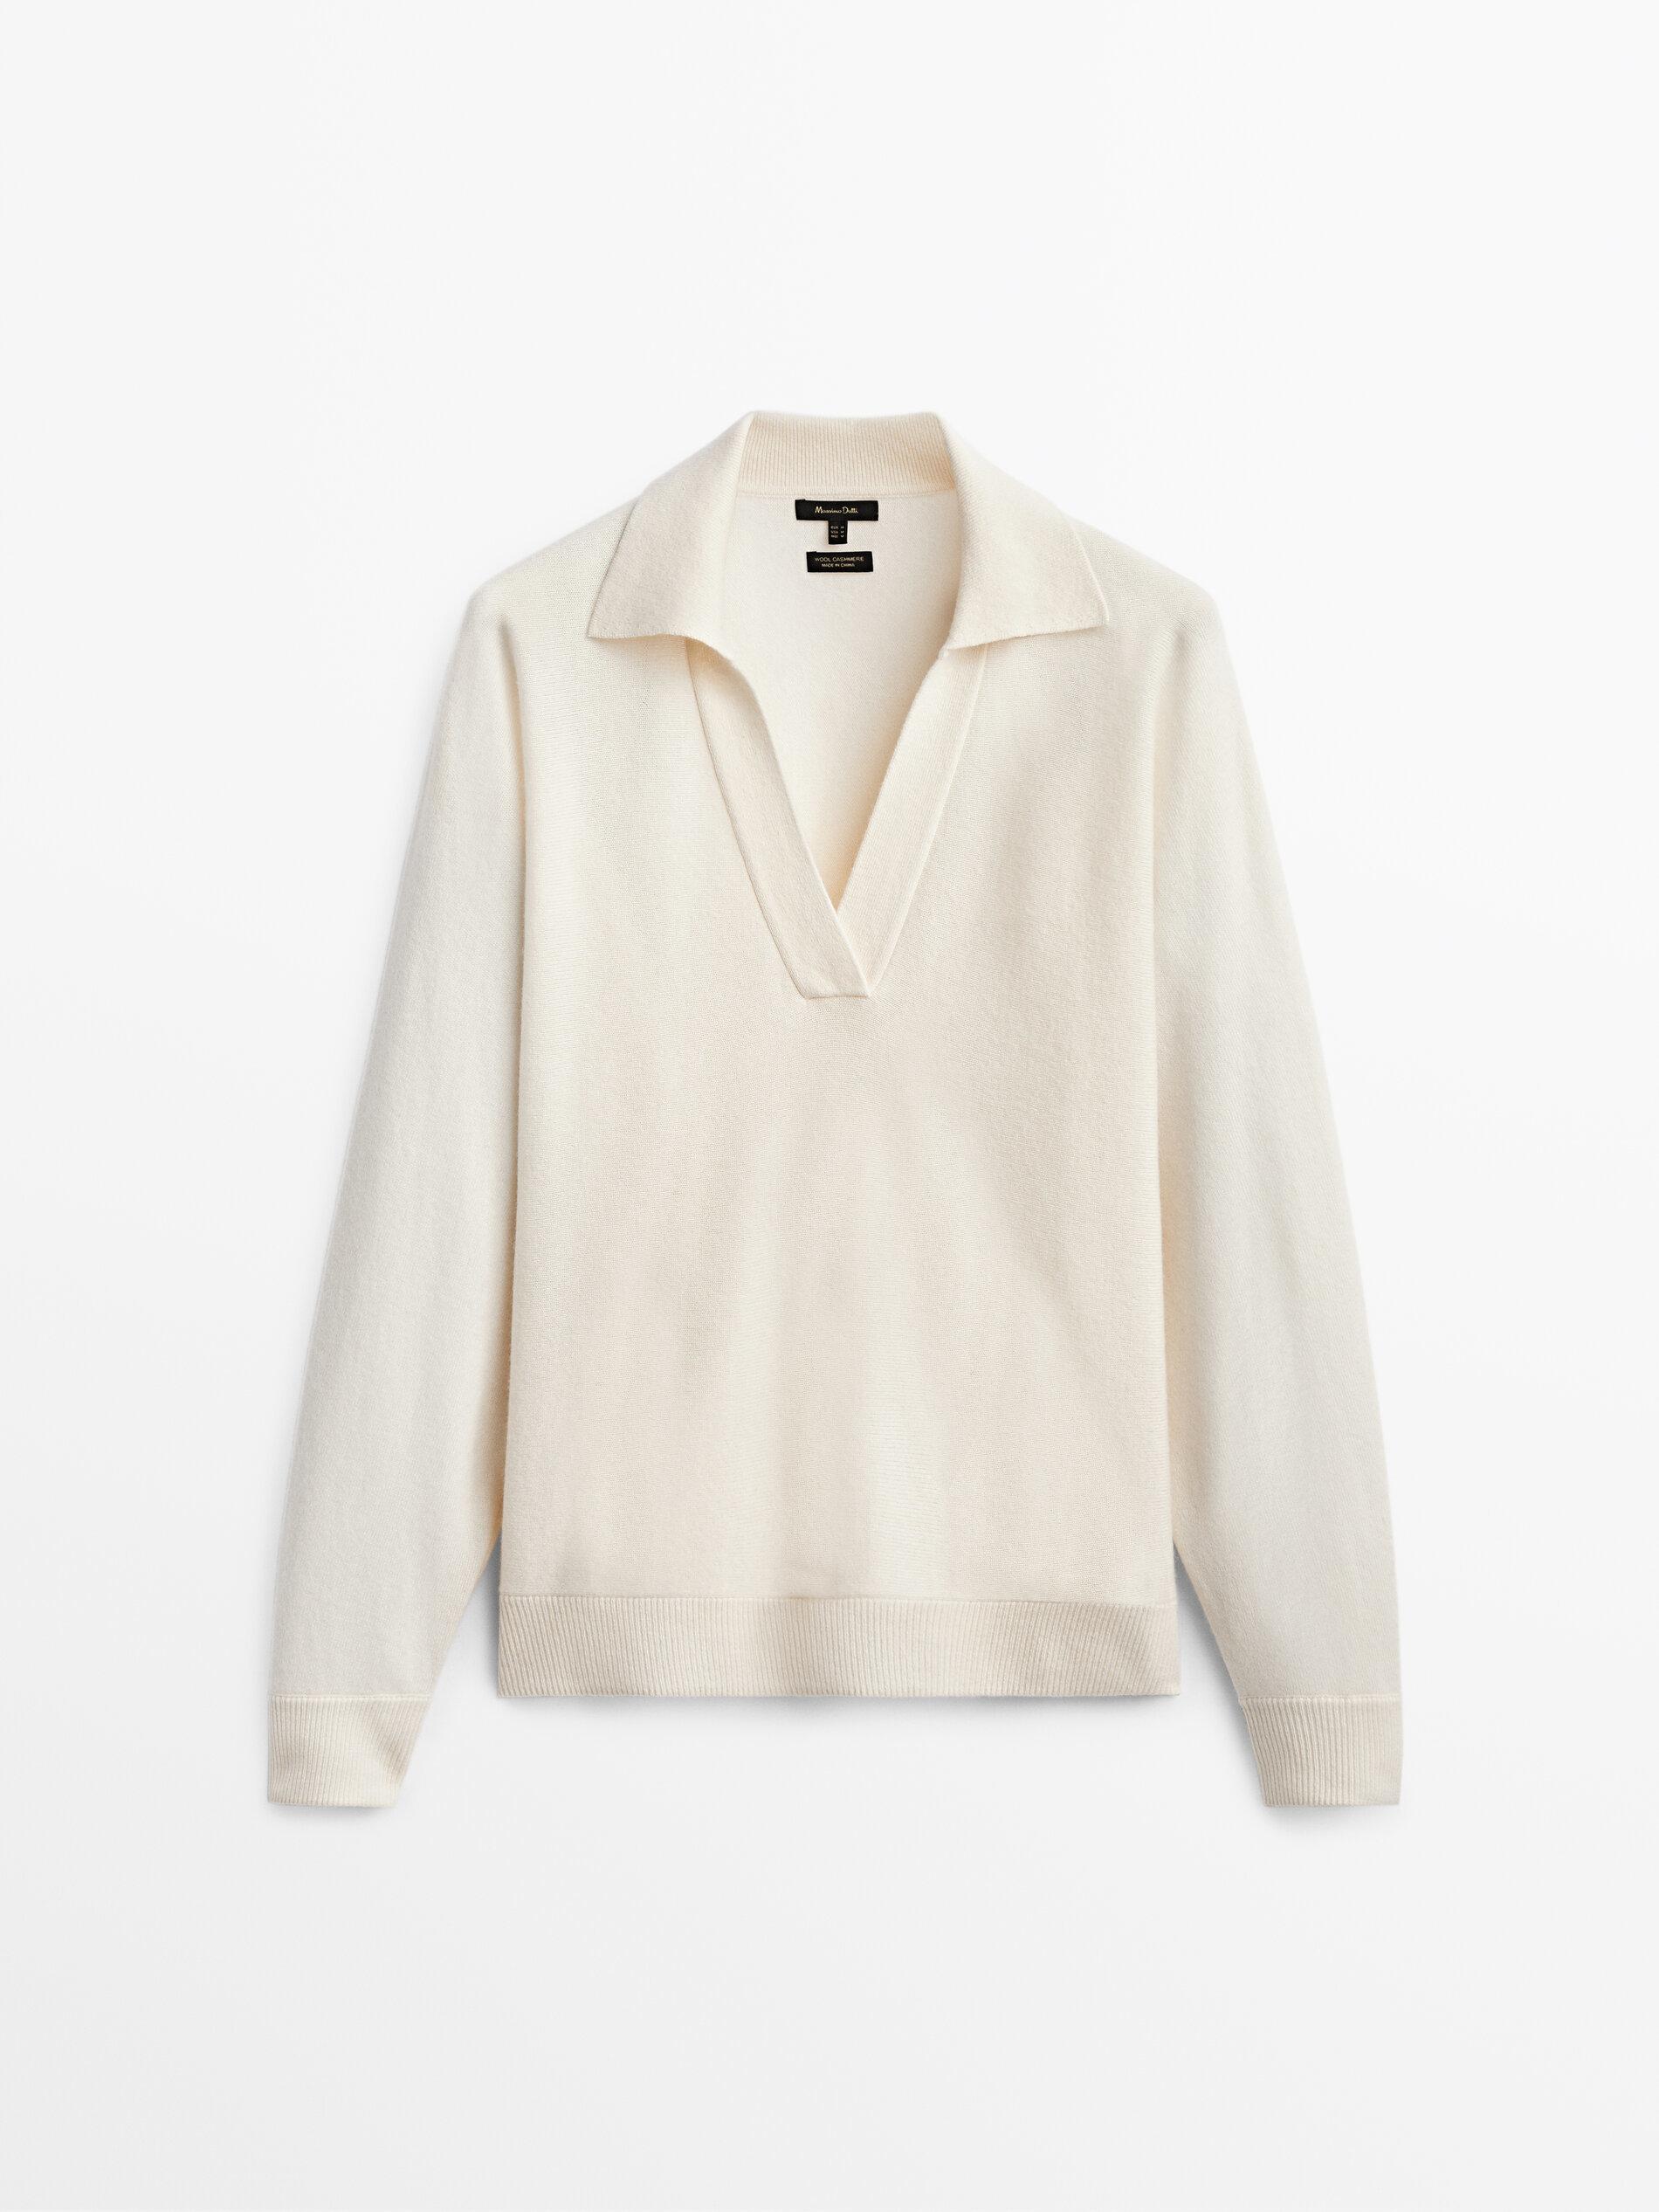 Jersey de cashmere de Massimo Dutti.